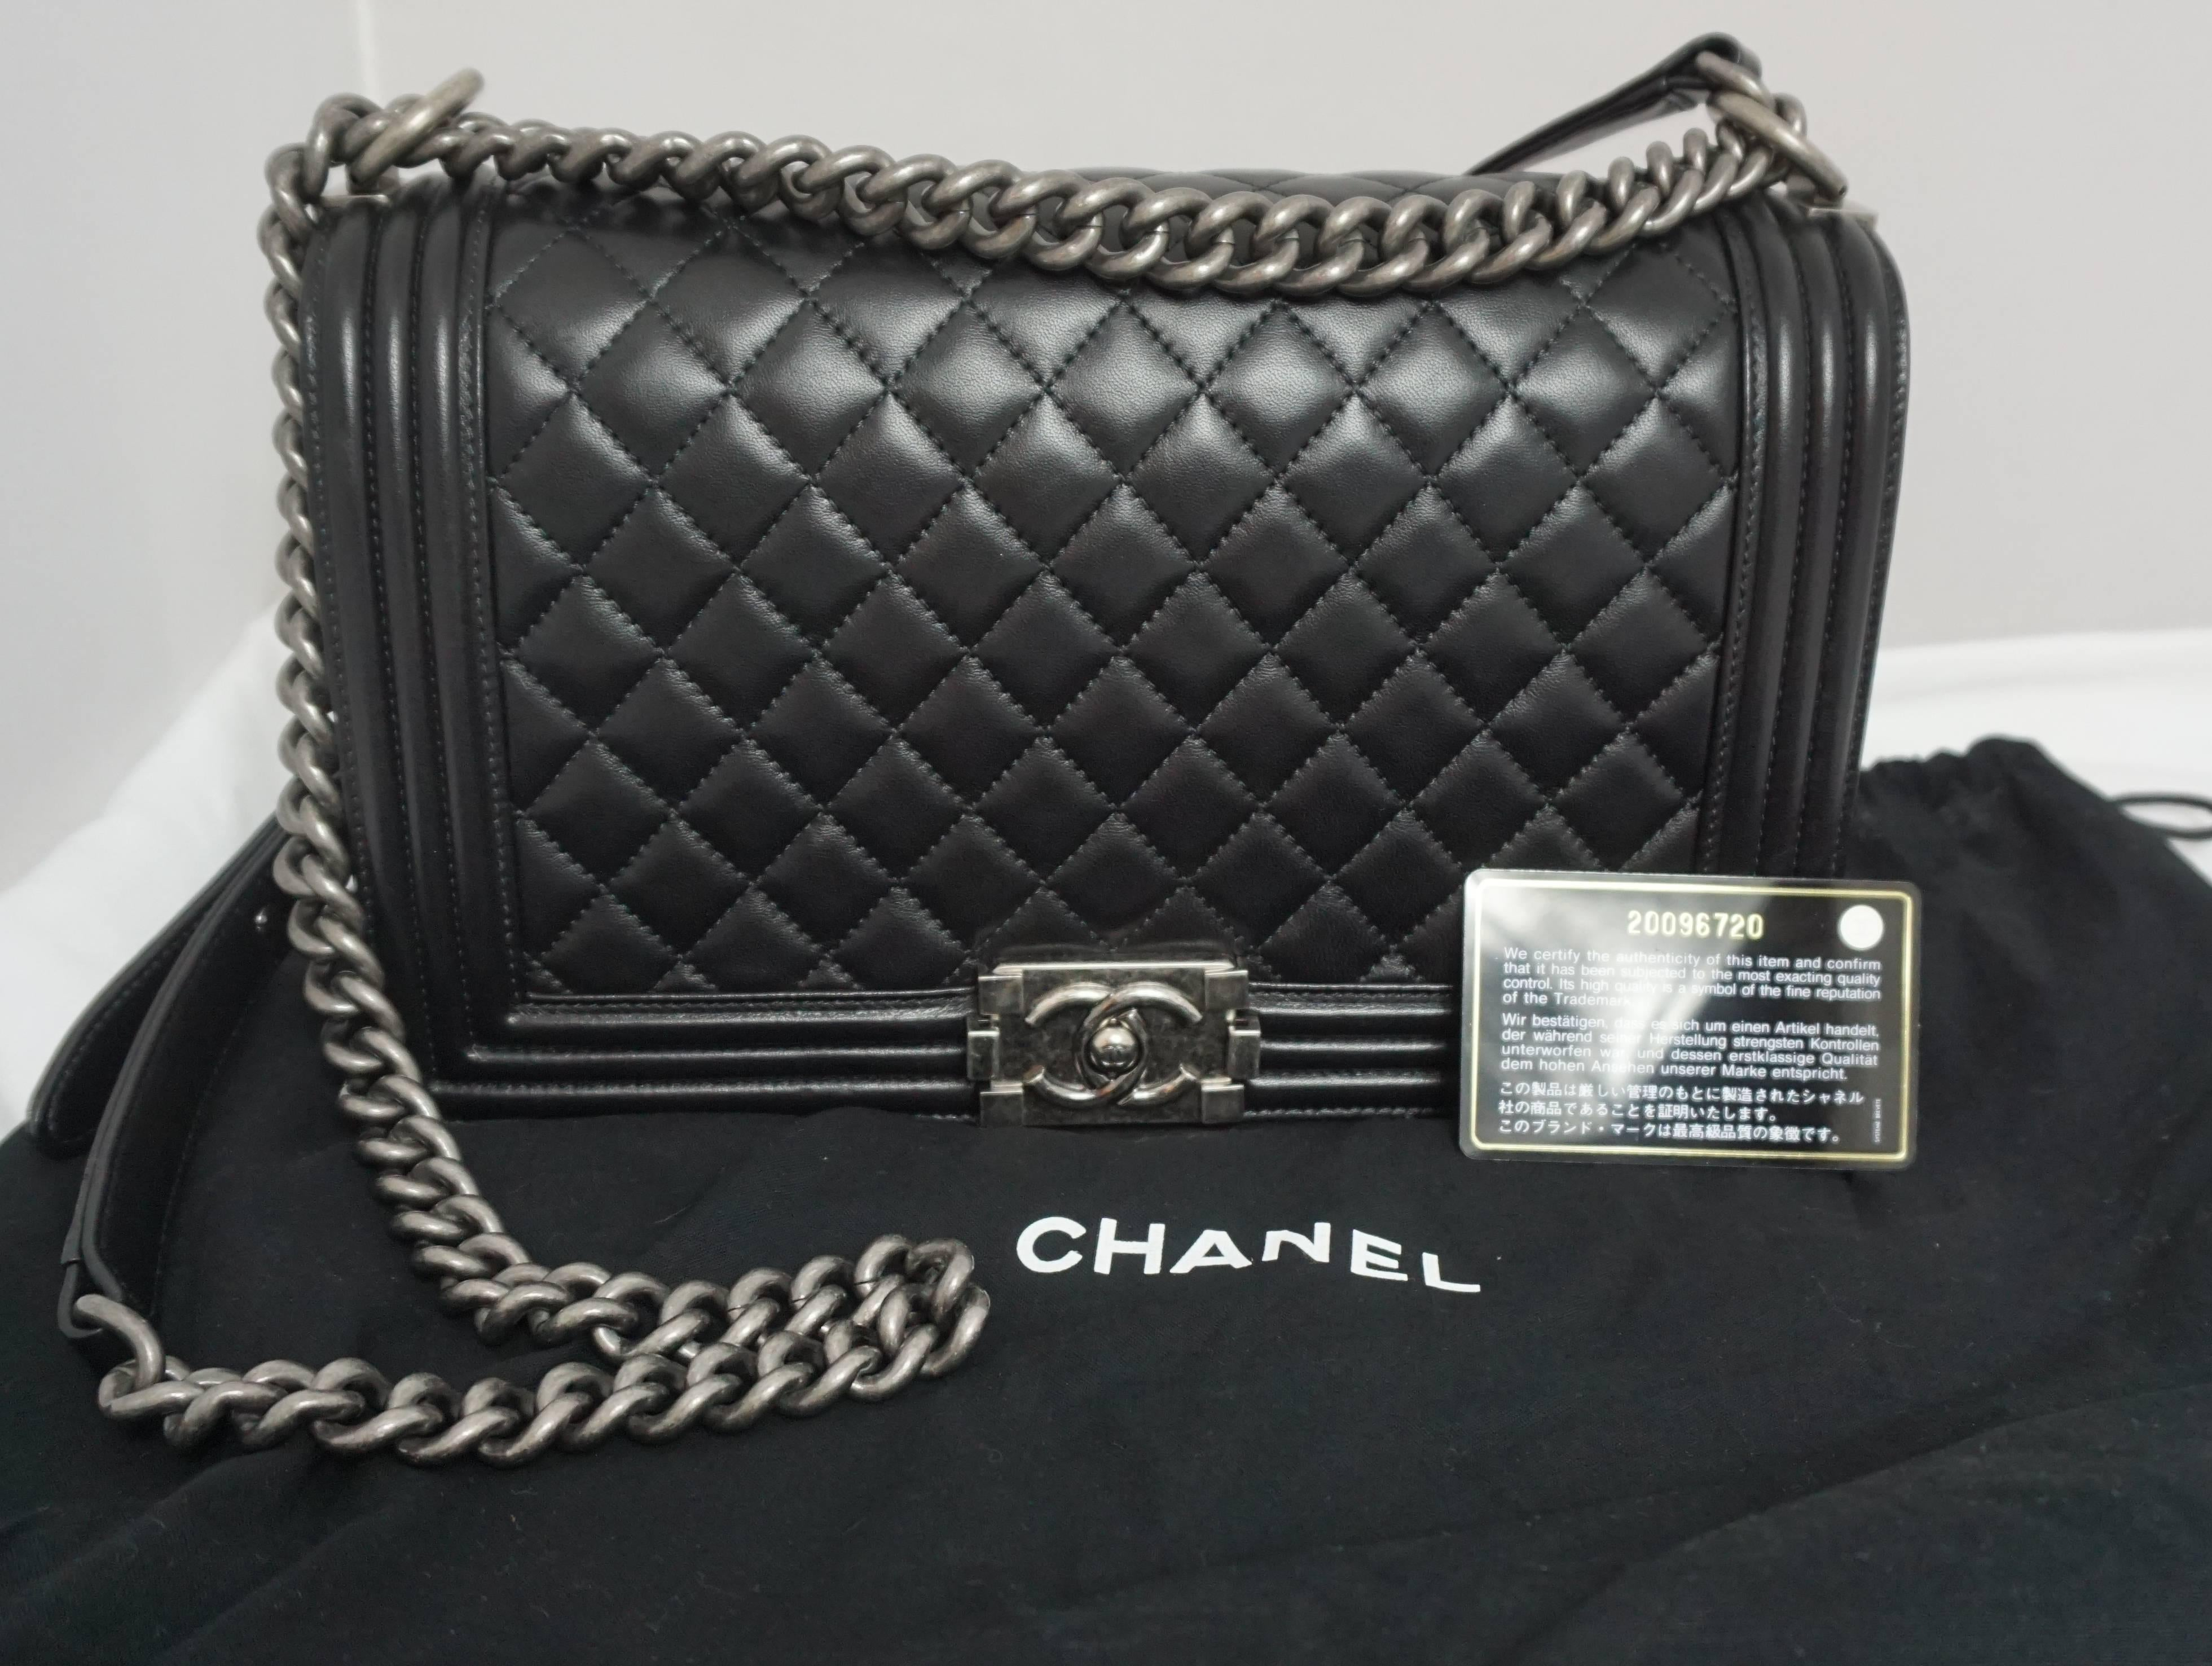 4ff2e69b291d Chanel Black Quilted Lambskin New Medium Boy Bag - PHW- Circa 2014 at  1stdibs